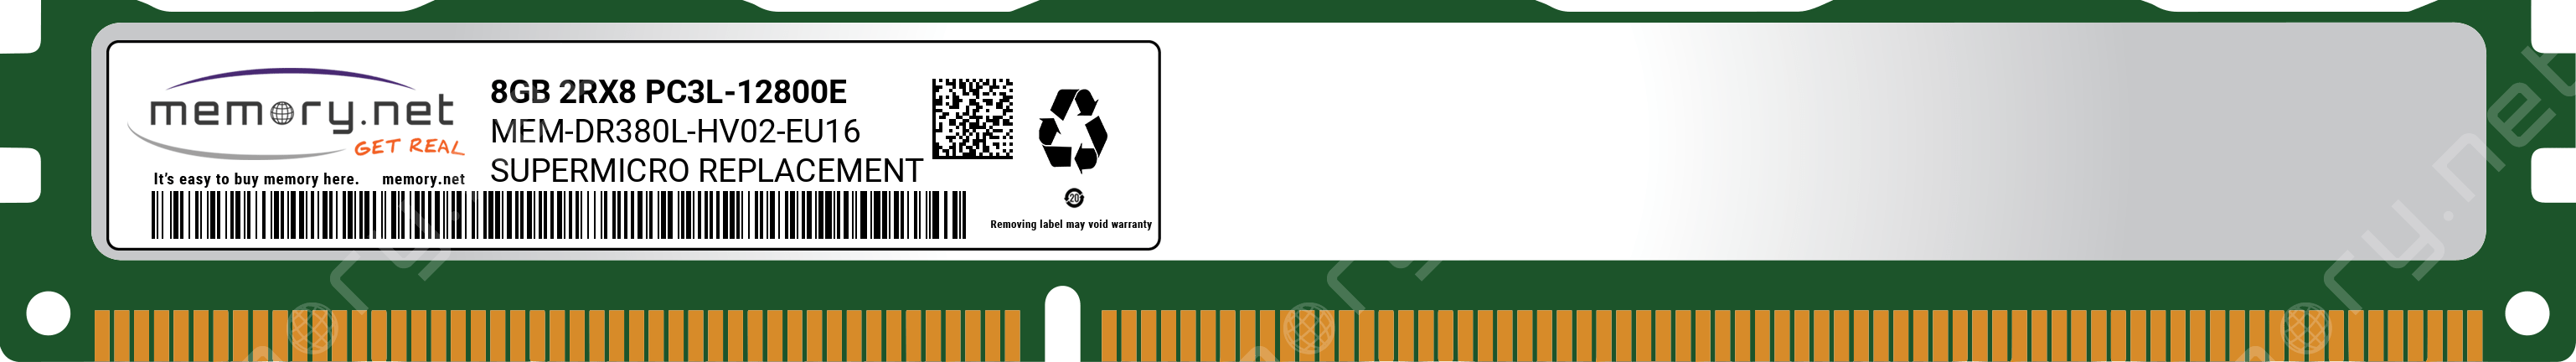 MEM-DR380L-HV02-EU16